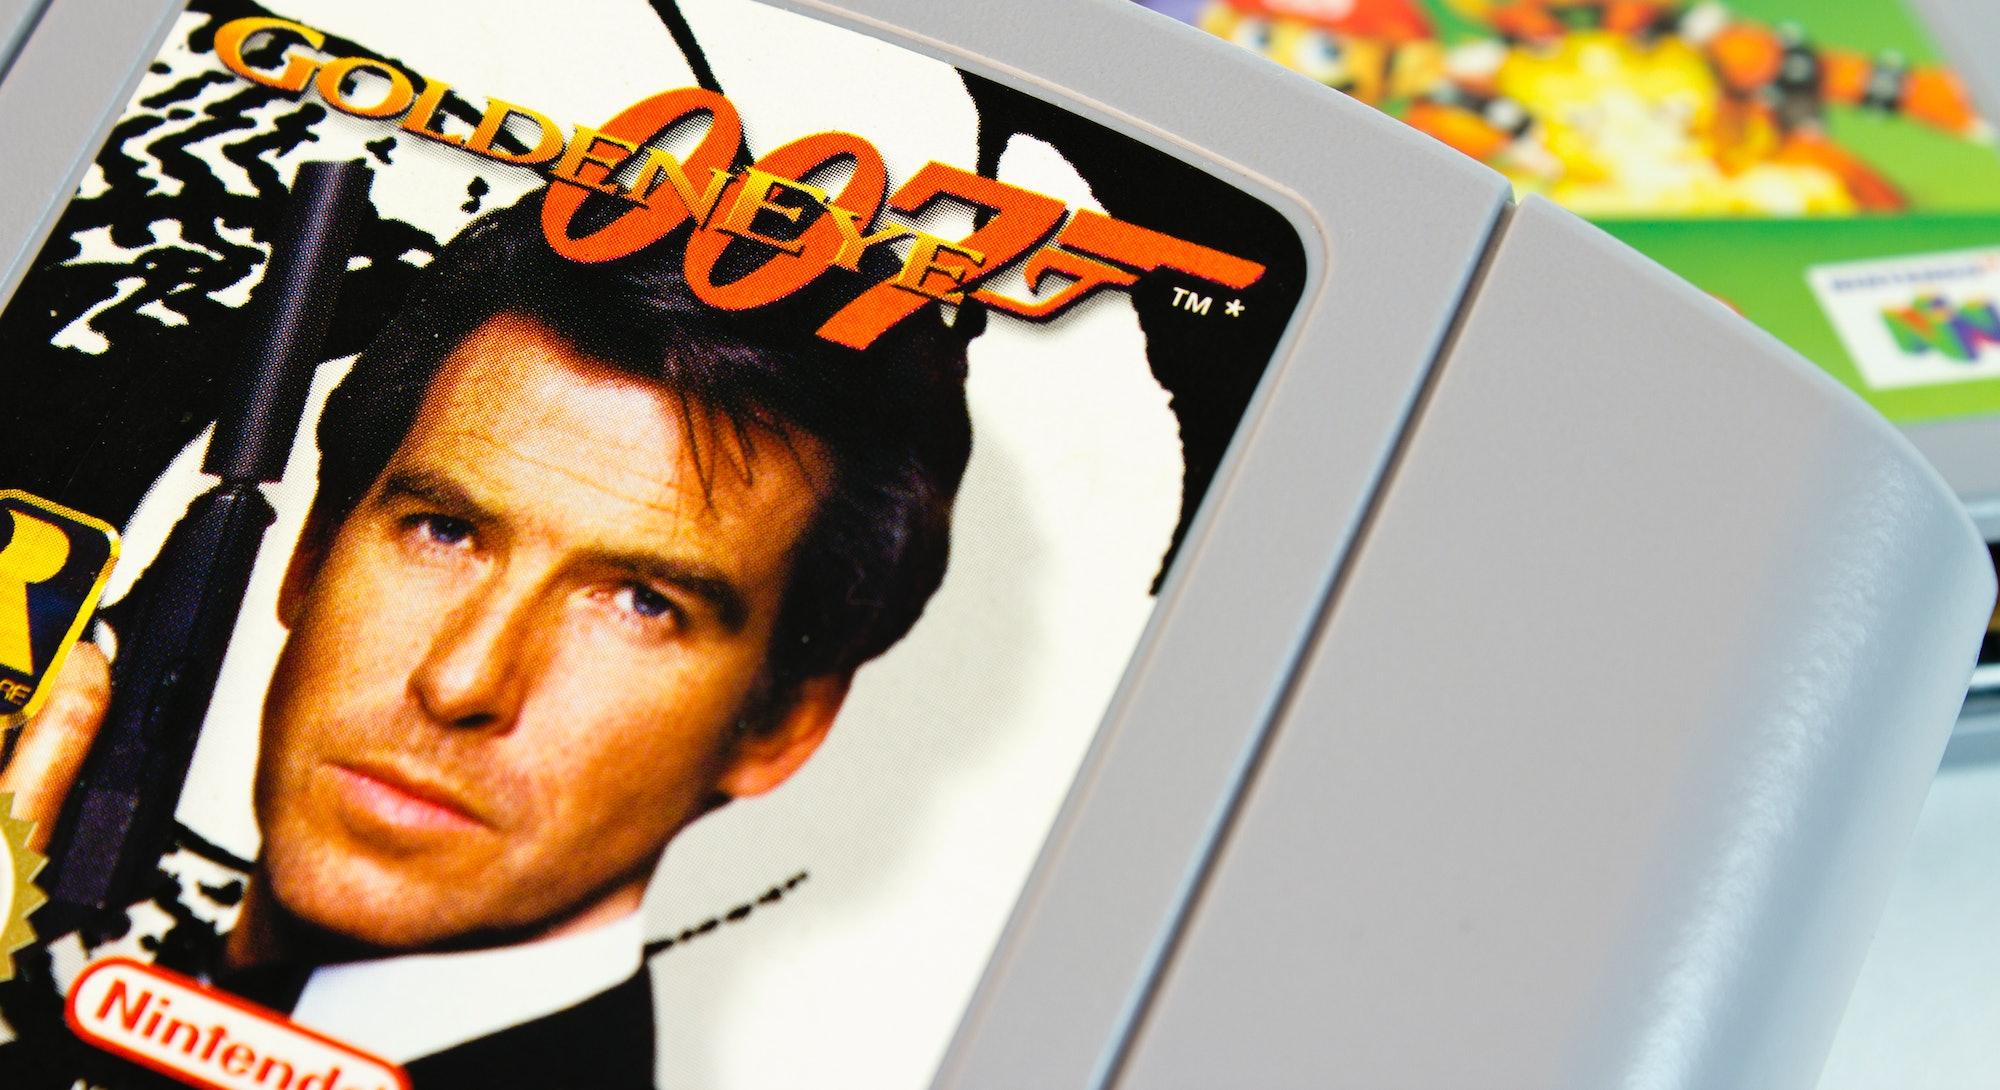 """Gothenburg, Sweden - April 15, 2011: Studio shot of the very popular Nintendo 64 game 007 Goldeneye..."